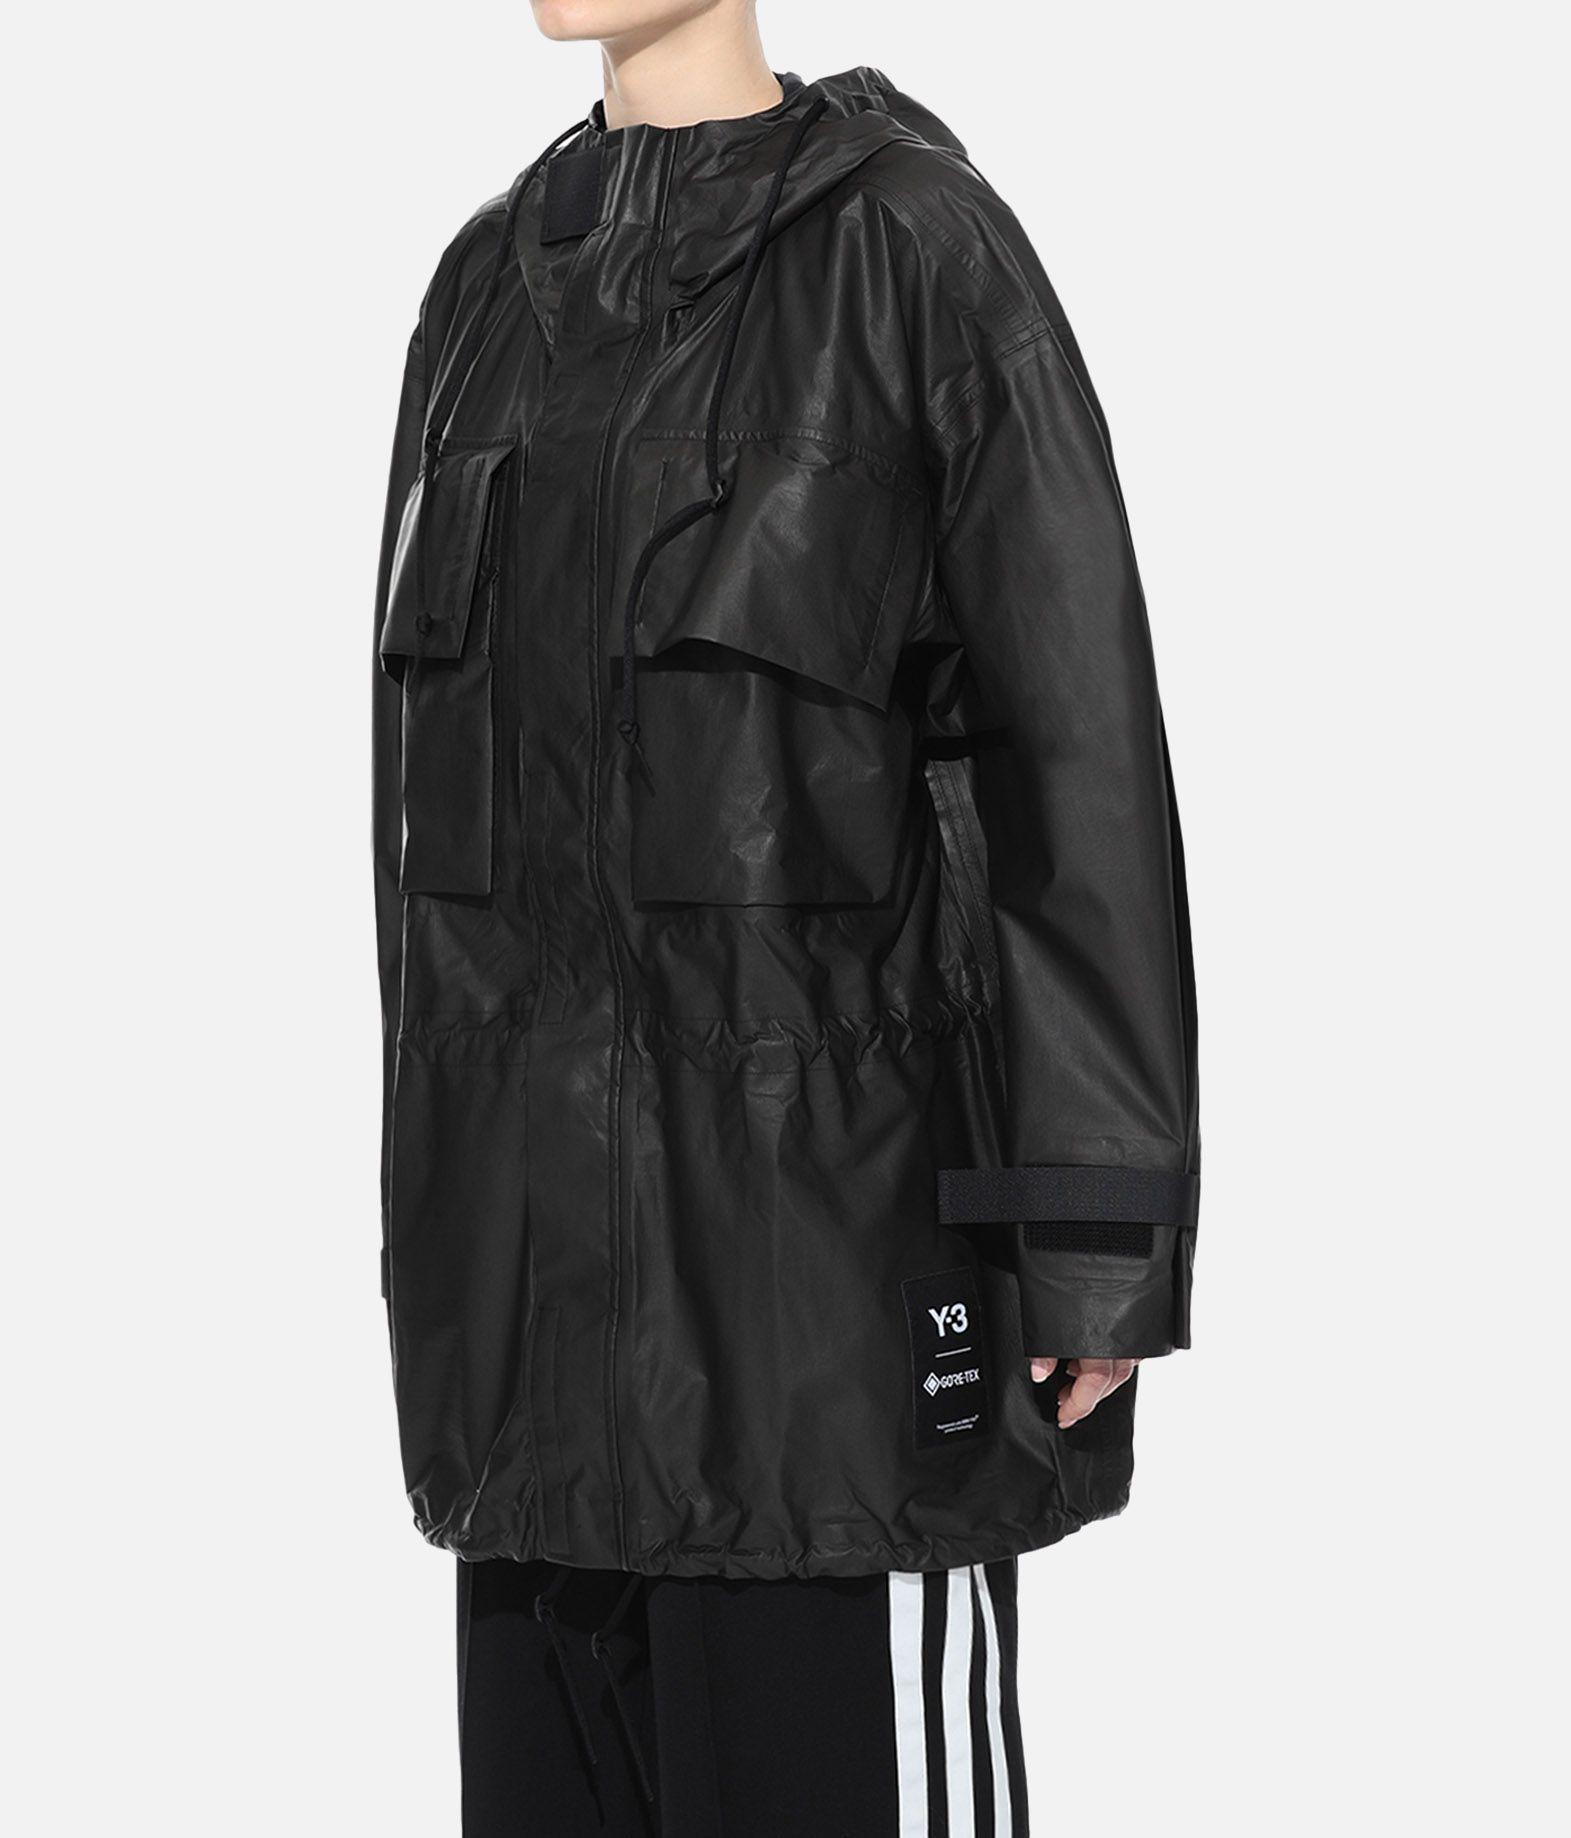 Y-3 Y-3 GORE-TEX Utility Hoodie Jacket Jacket Woman e